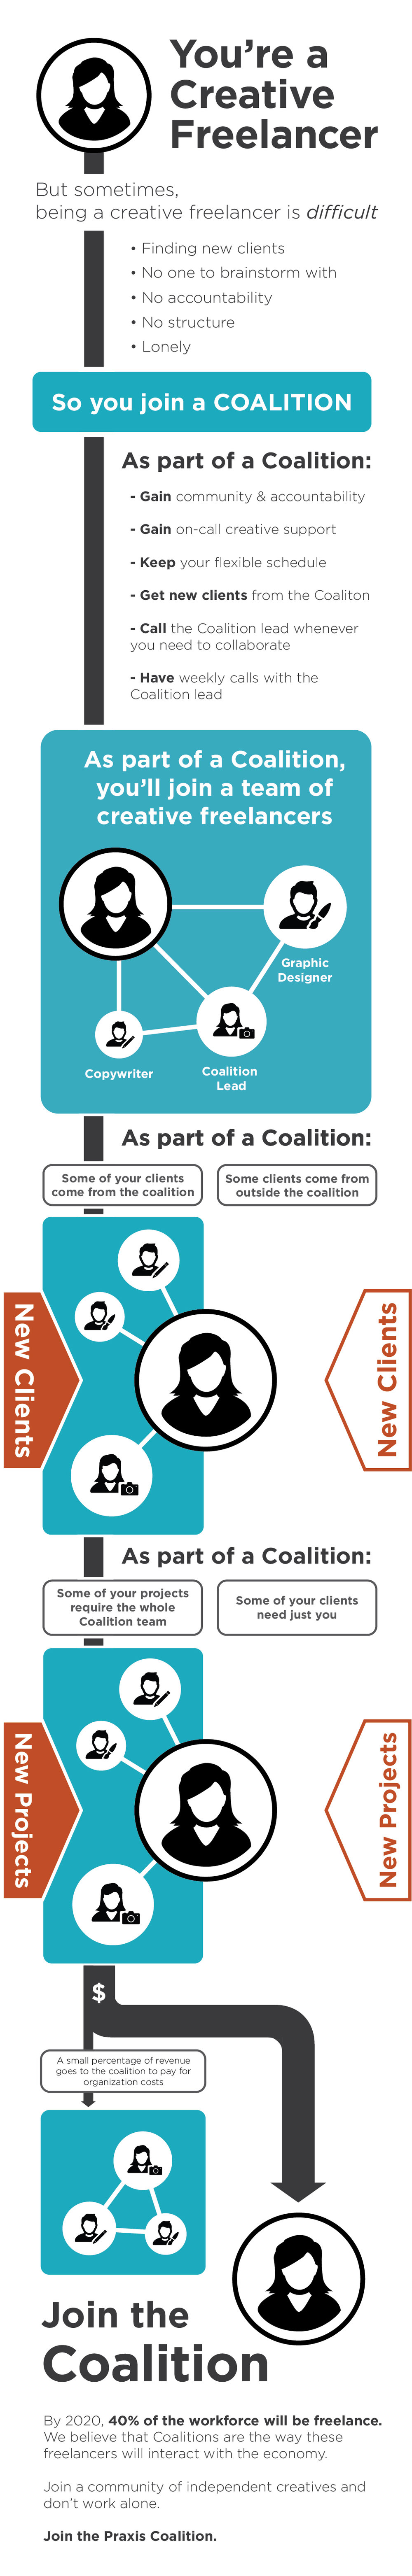 Coalition-rgb-04.jpg